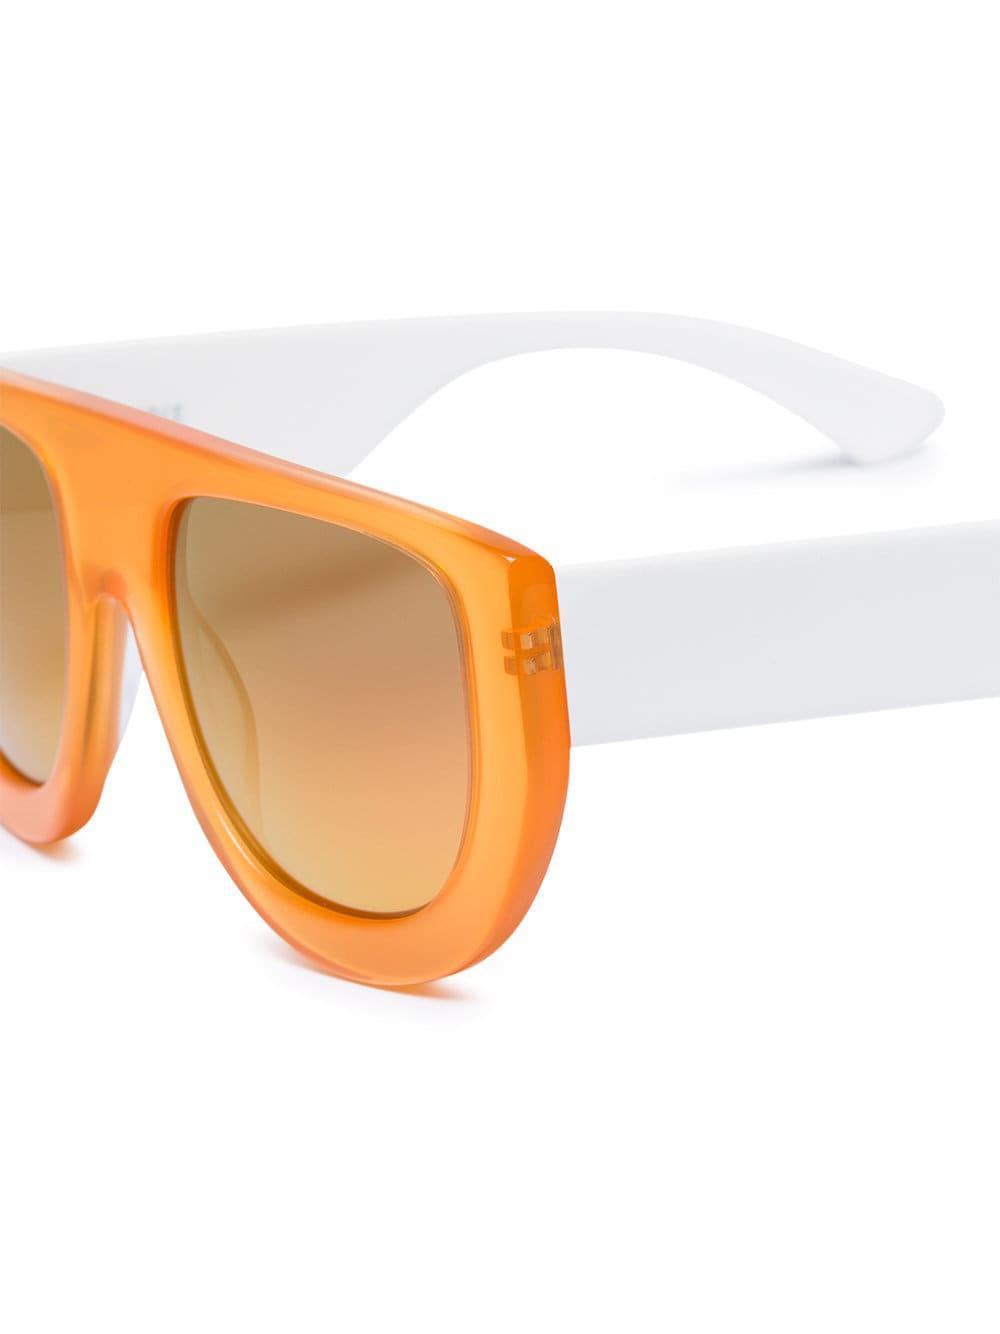 And Ganni Lyst Sunglasses In White Yellow Ines Orange HOOwSqT